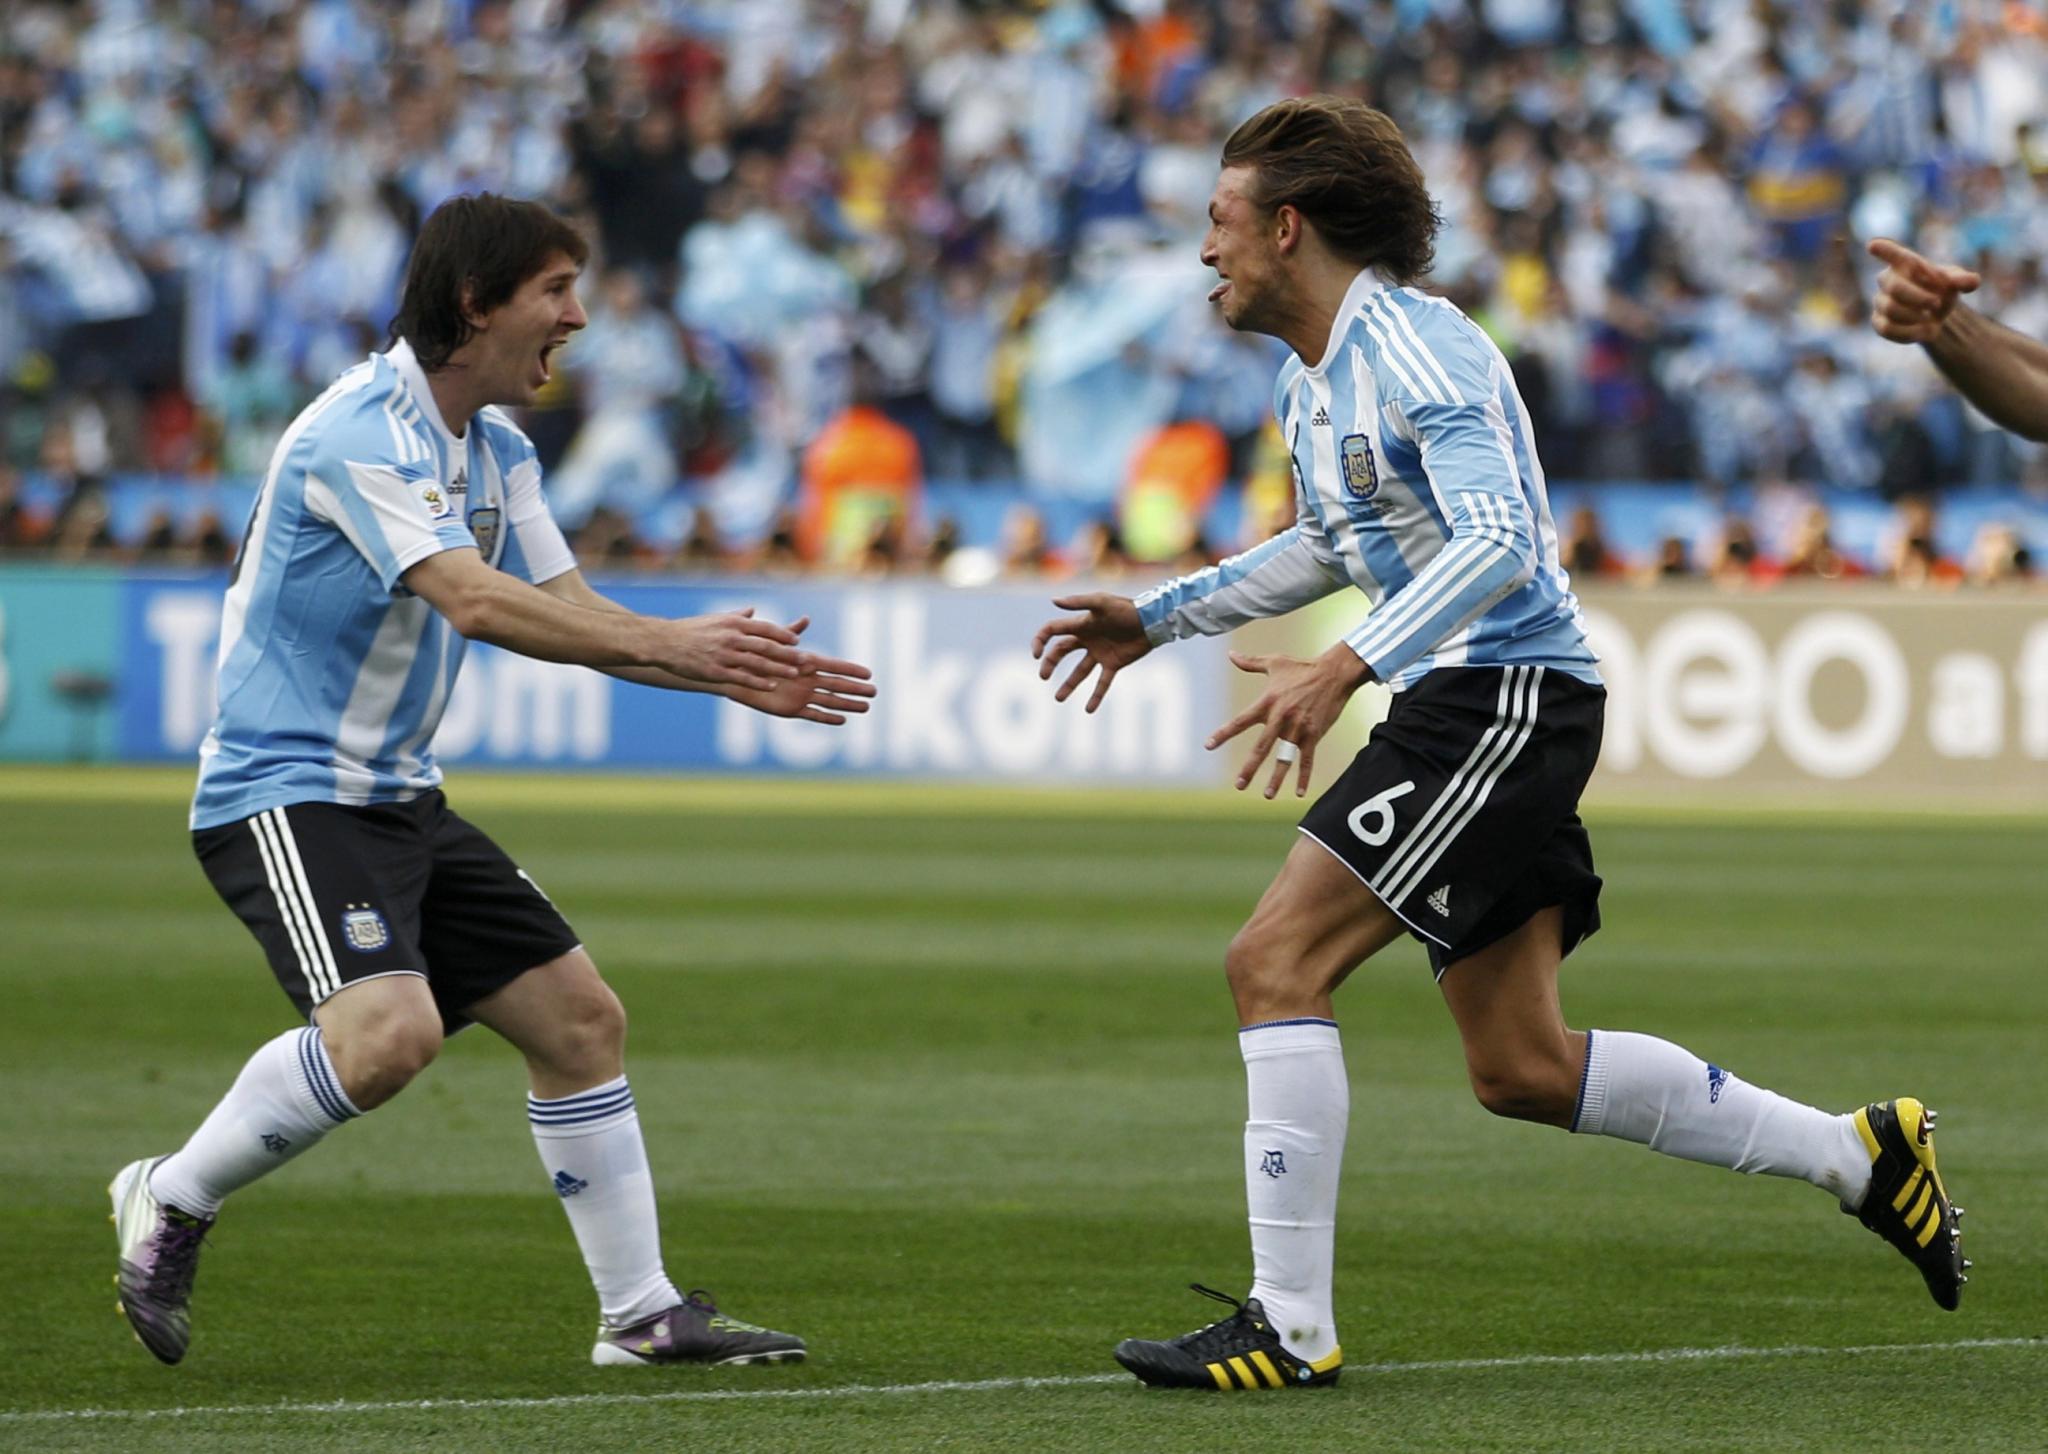 Un gol de cabeza de Heinze le da la victoria a Argentina